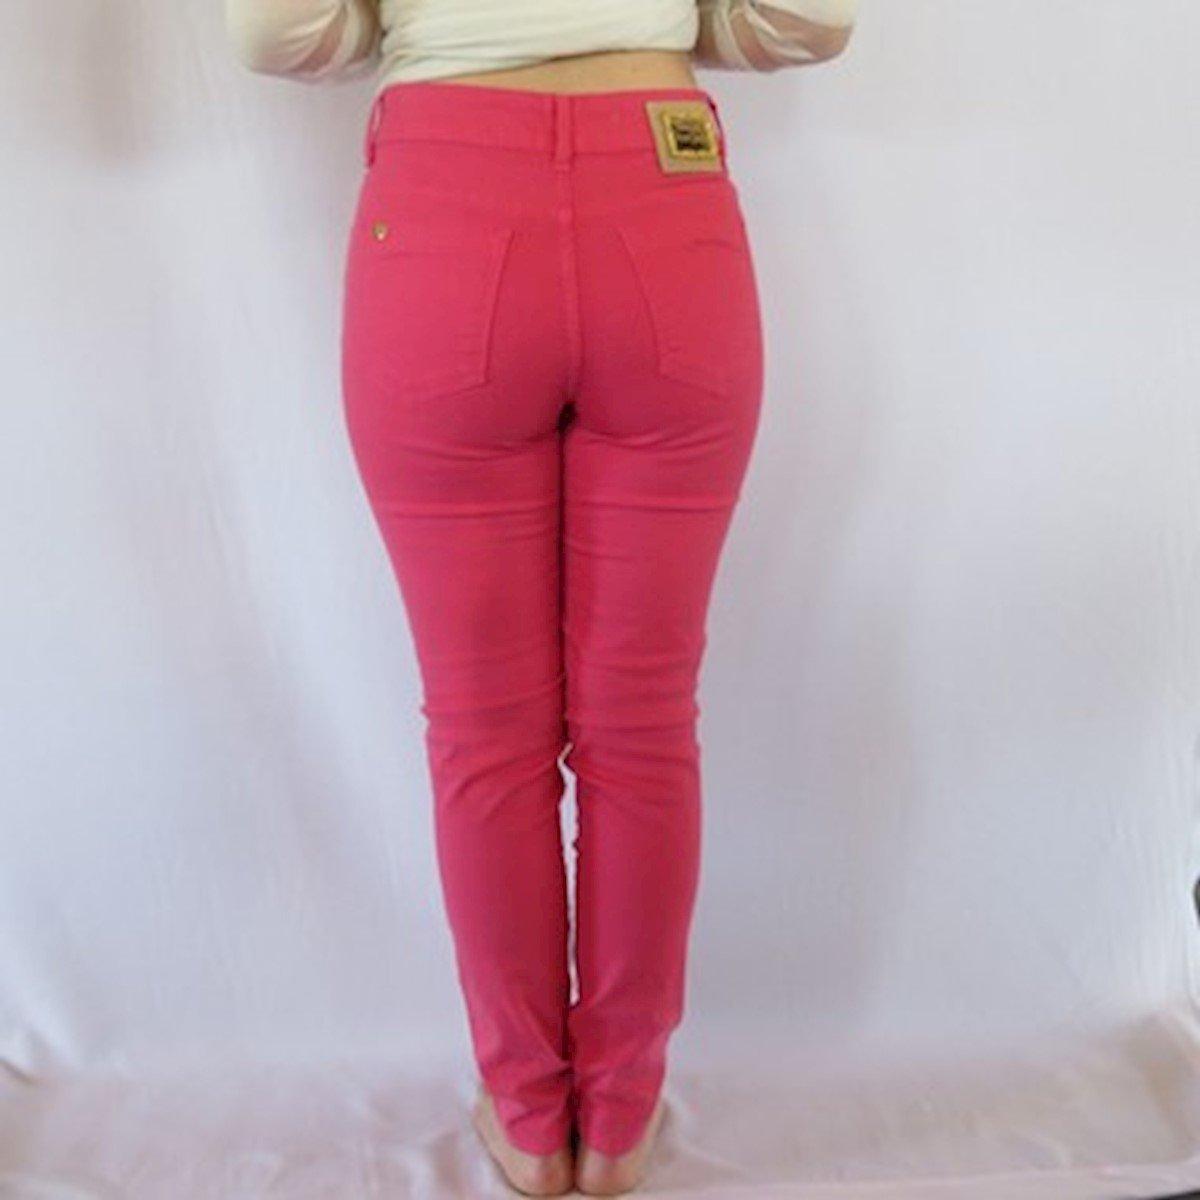 Calça Rosa Visual Feminina Calça Visual Jeans PR1wPzqT